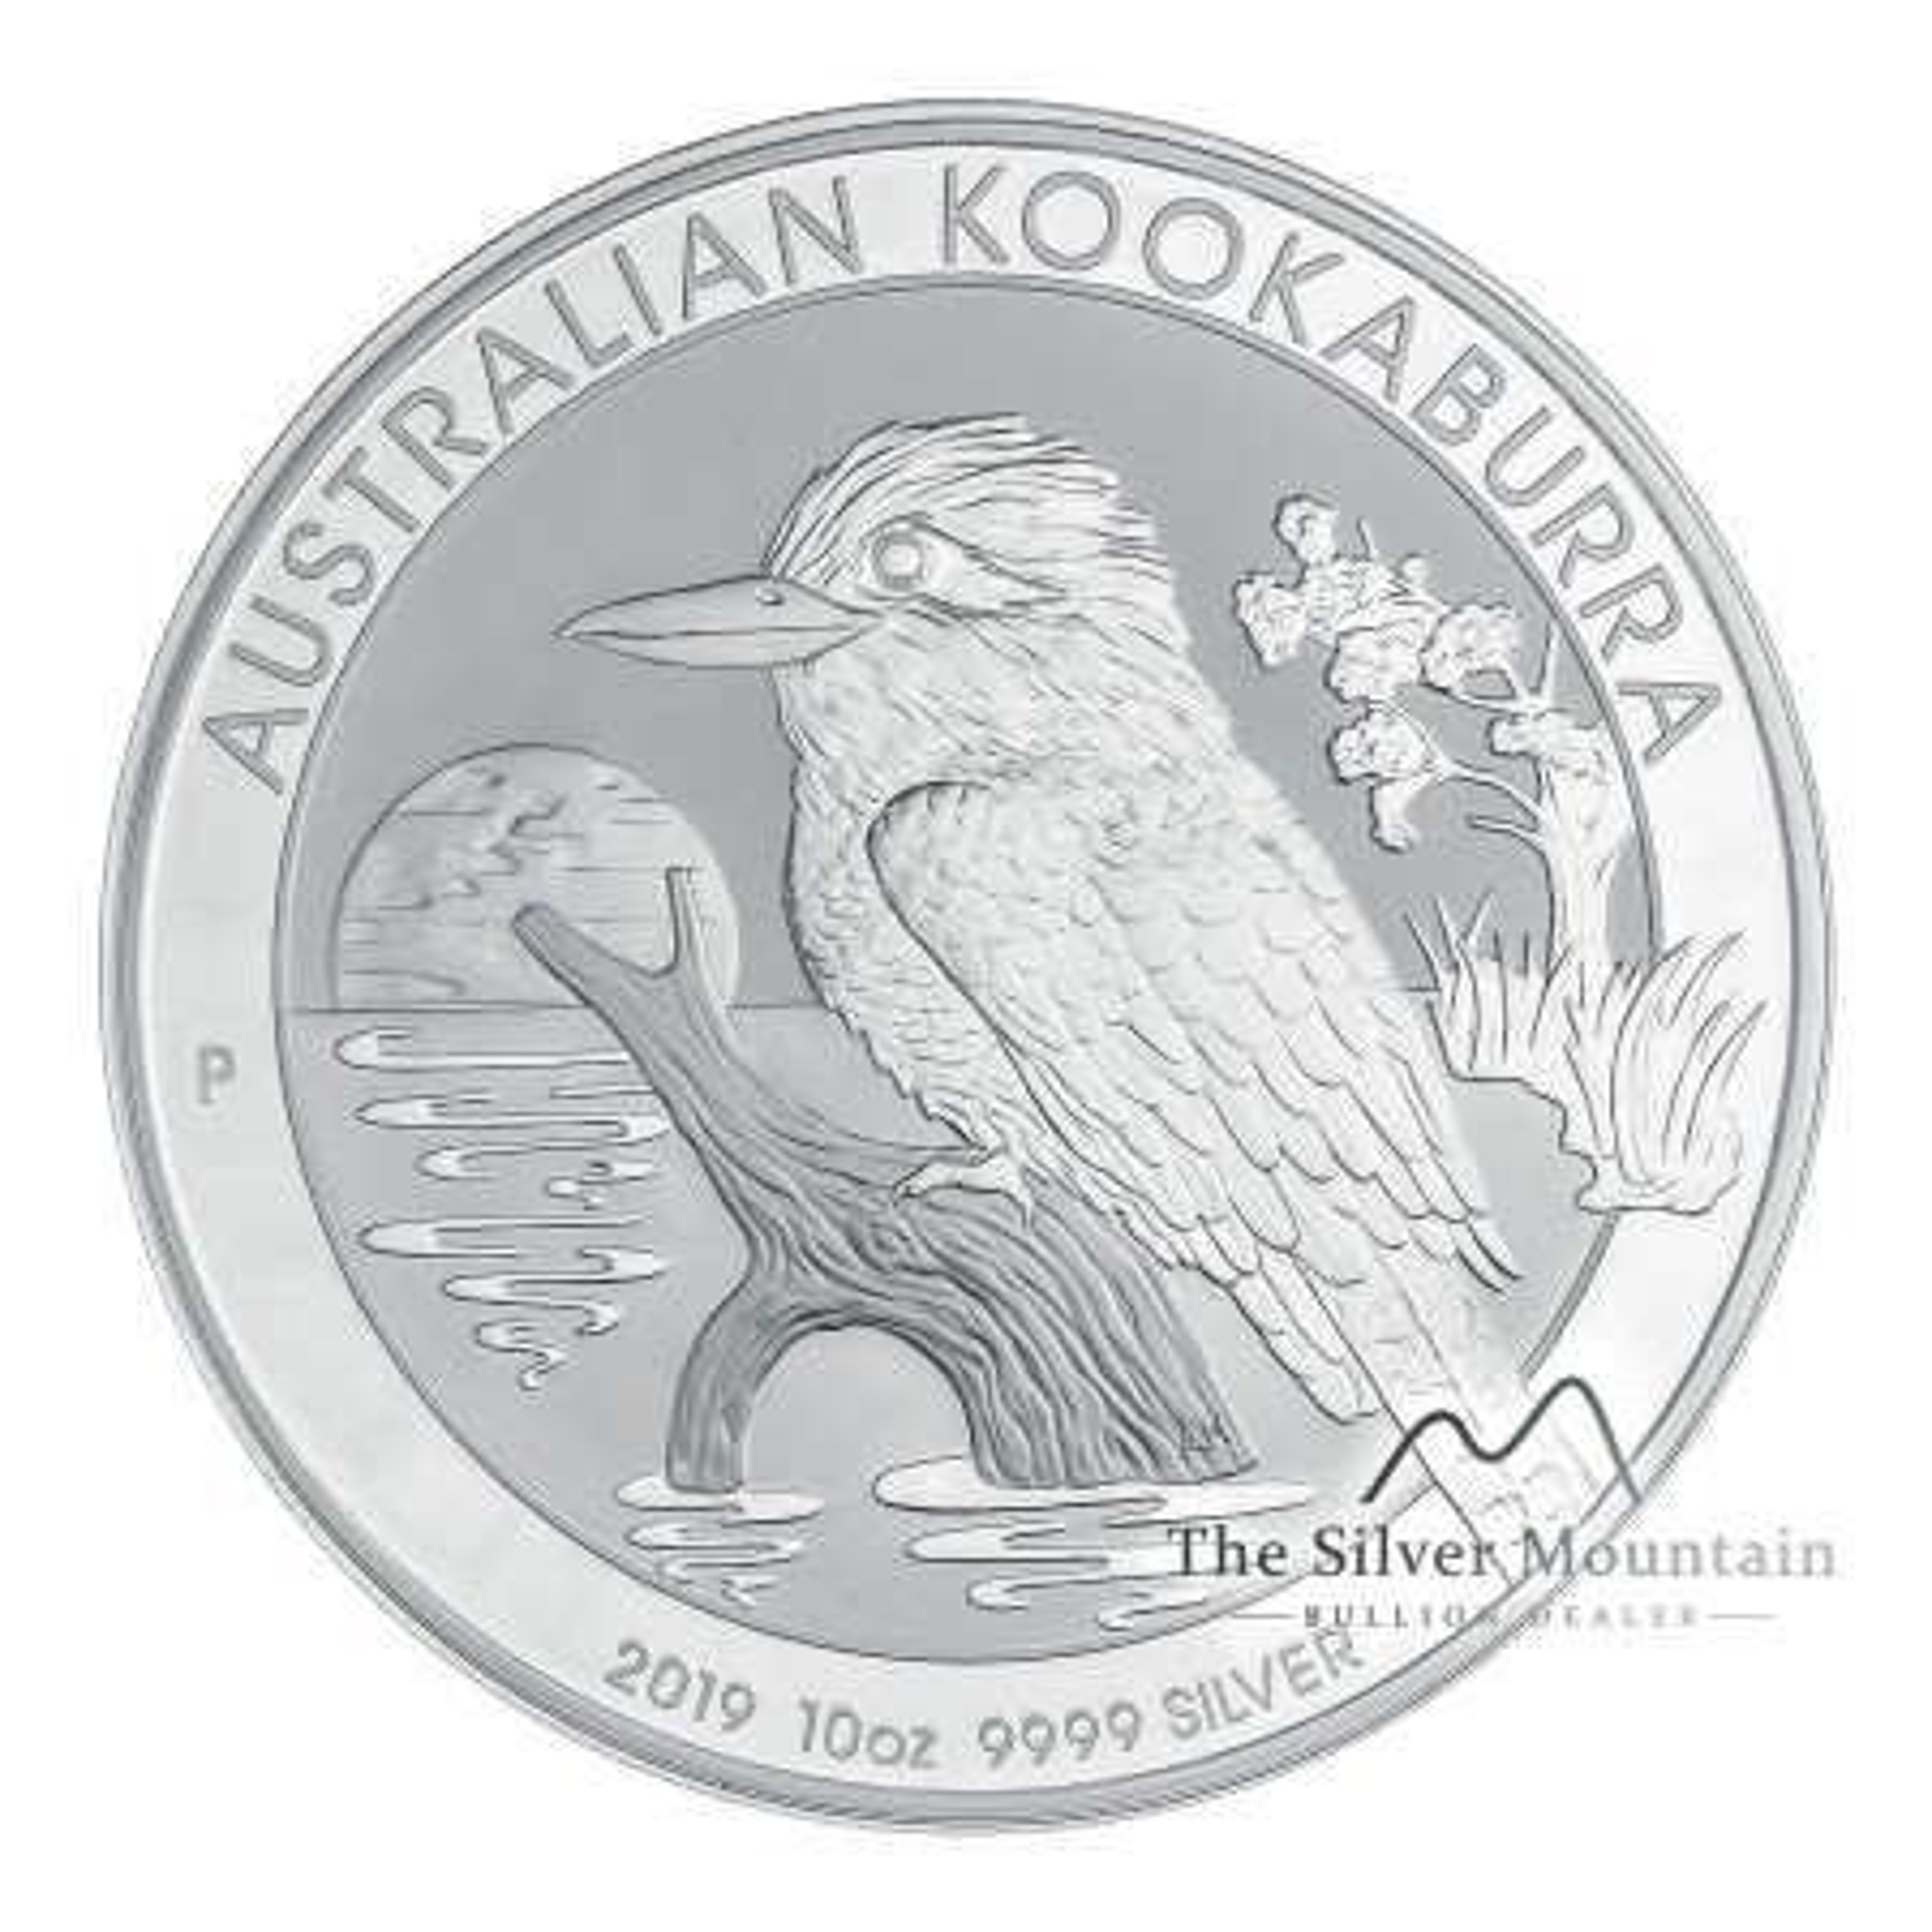 Gekleurde zilveren 10 troy ounce Lunar munt 2012